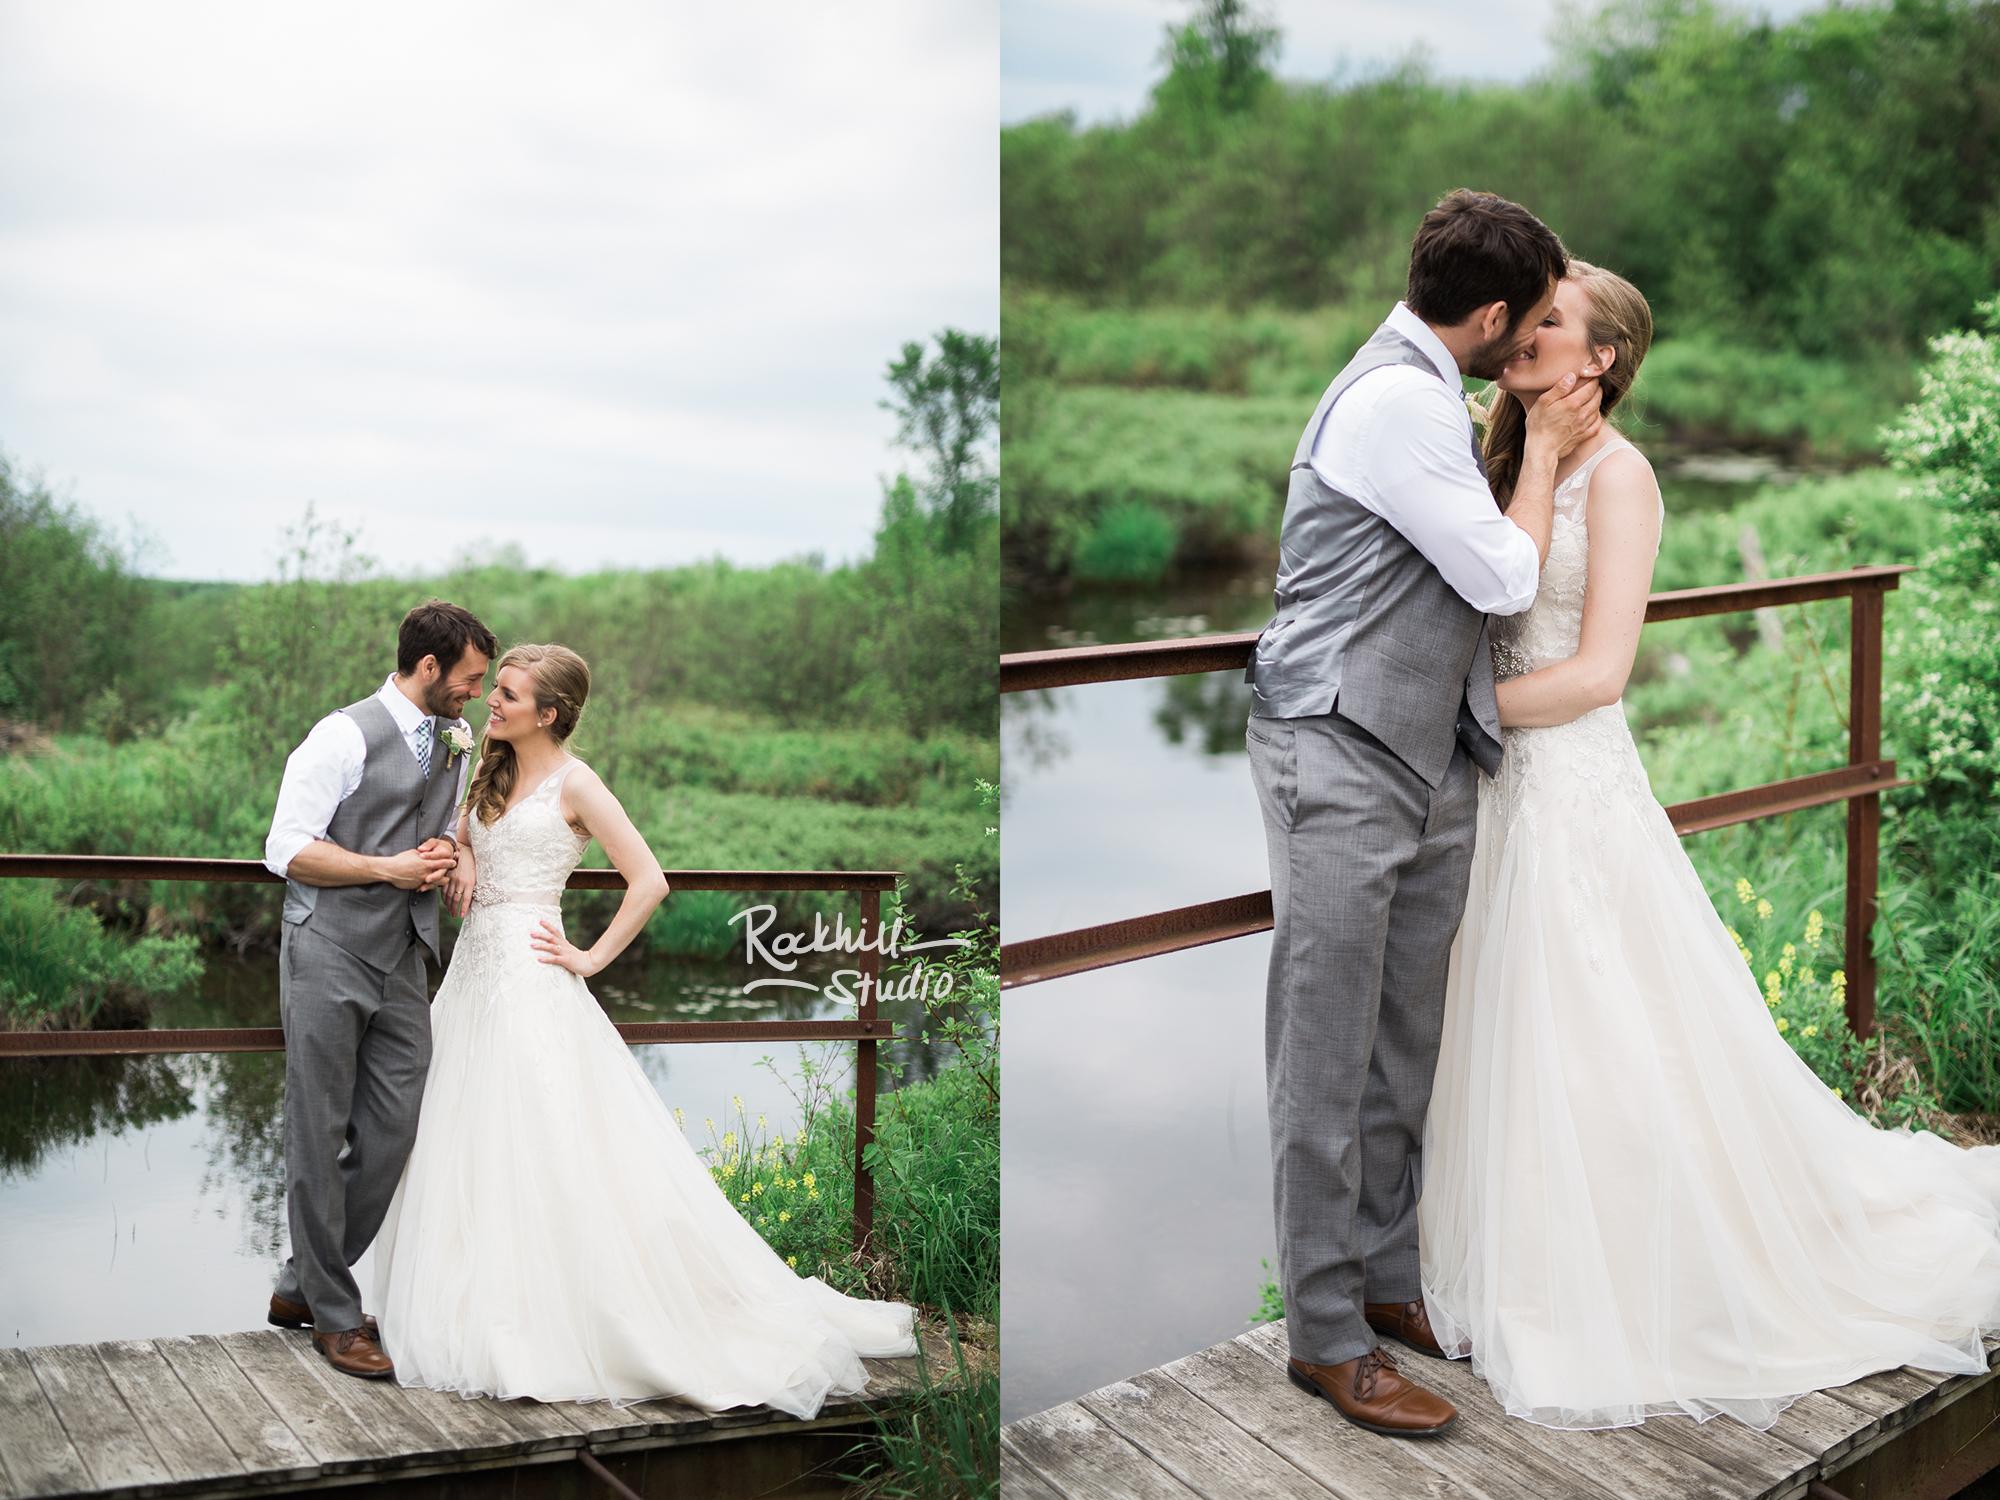 marquette-michigan-wedding-upper-peninsula-spring-photography-rockhill-ee-50.jpg